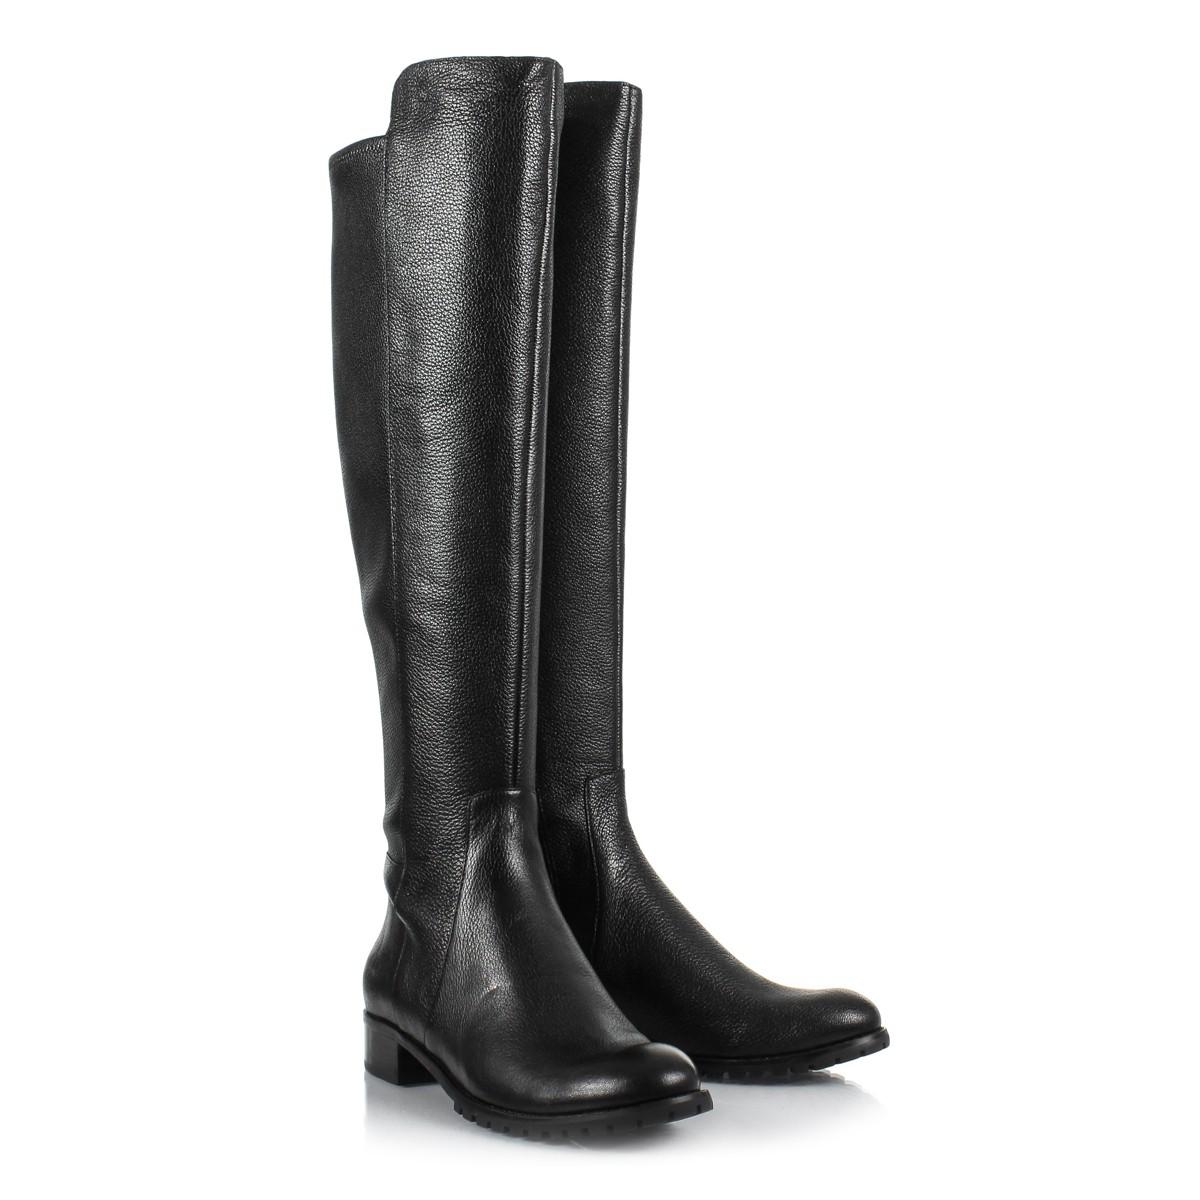 michael-by-michael-kors-joanie-flat-boot-michael-by-michael-kors-joanie-flat-boot--shoebaloo.nl--shoebaloo.jpg